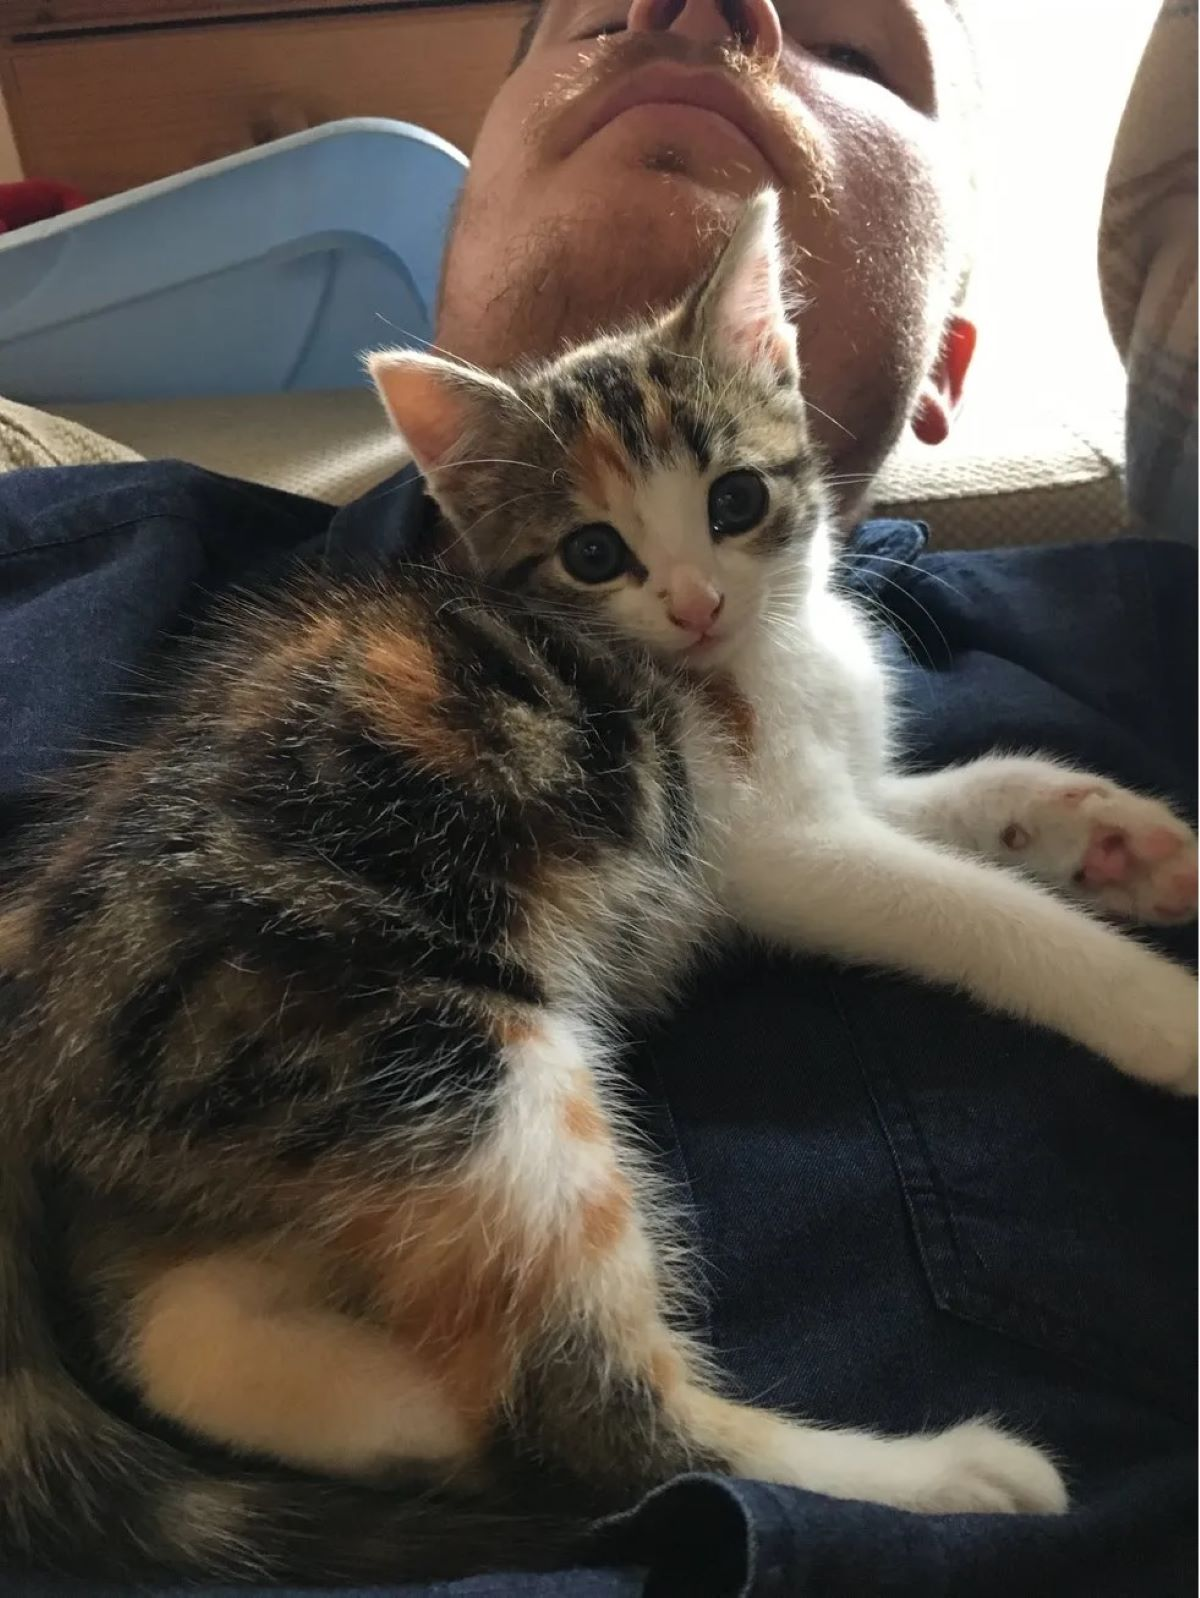 gattina-in-grembo